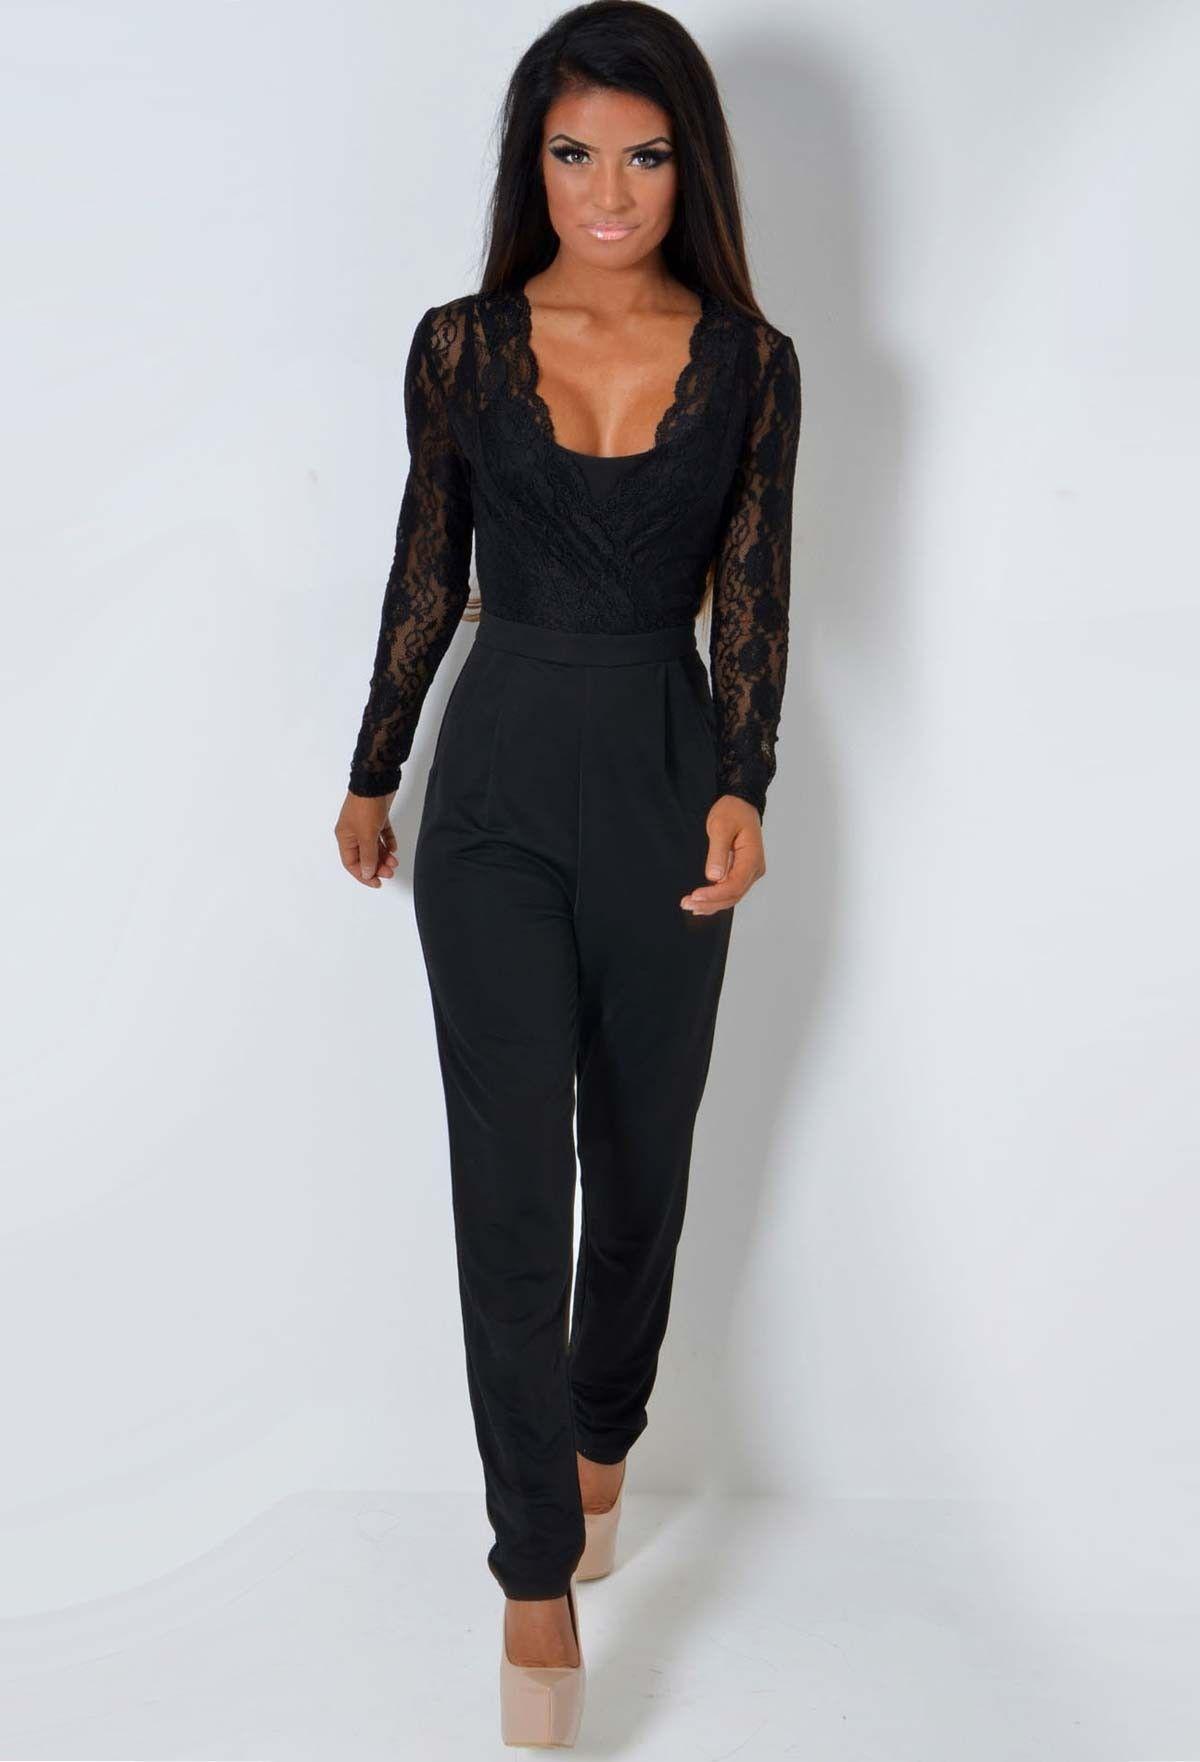 1c57f97001 Maita Black Lace Plunge Wrap Long Sleeve Jumpsuit - 8 | Mine ...